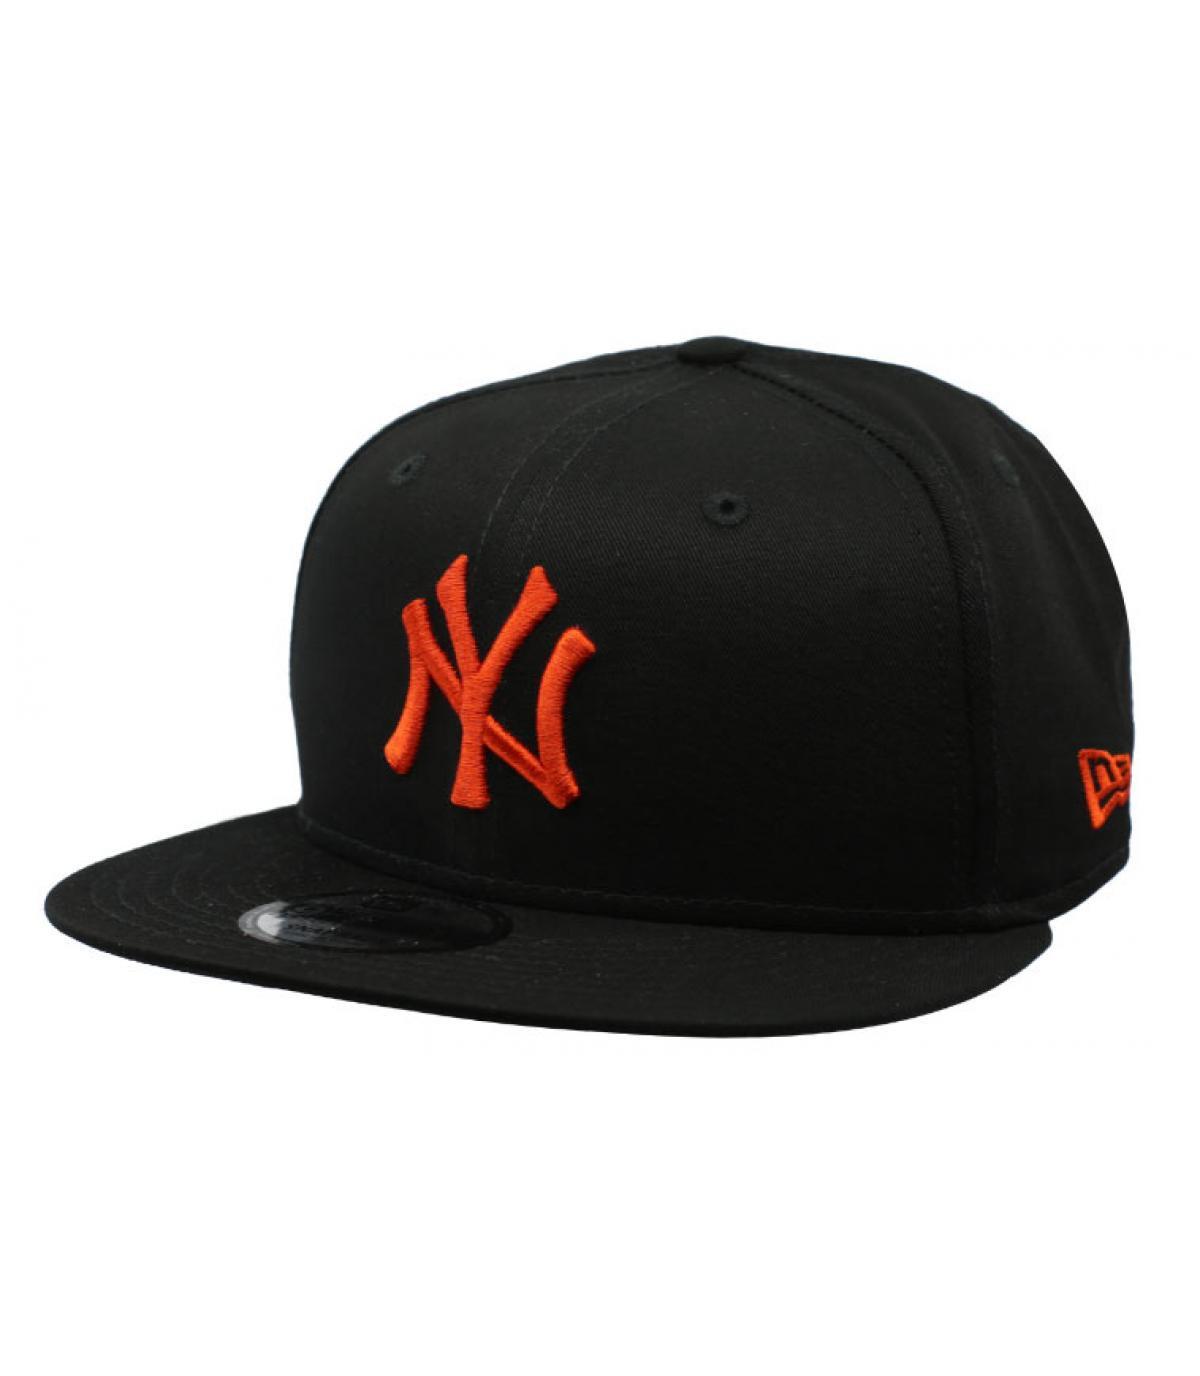 30b08654017f ... Details Snapback Kids League Ess NY 9Fifty black orange - Abbildung 1  ...